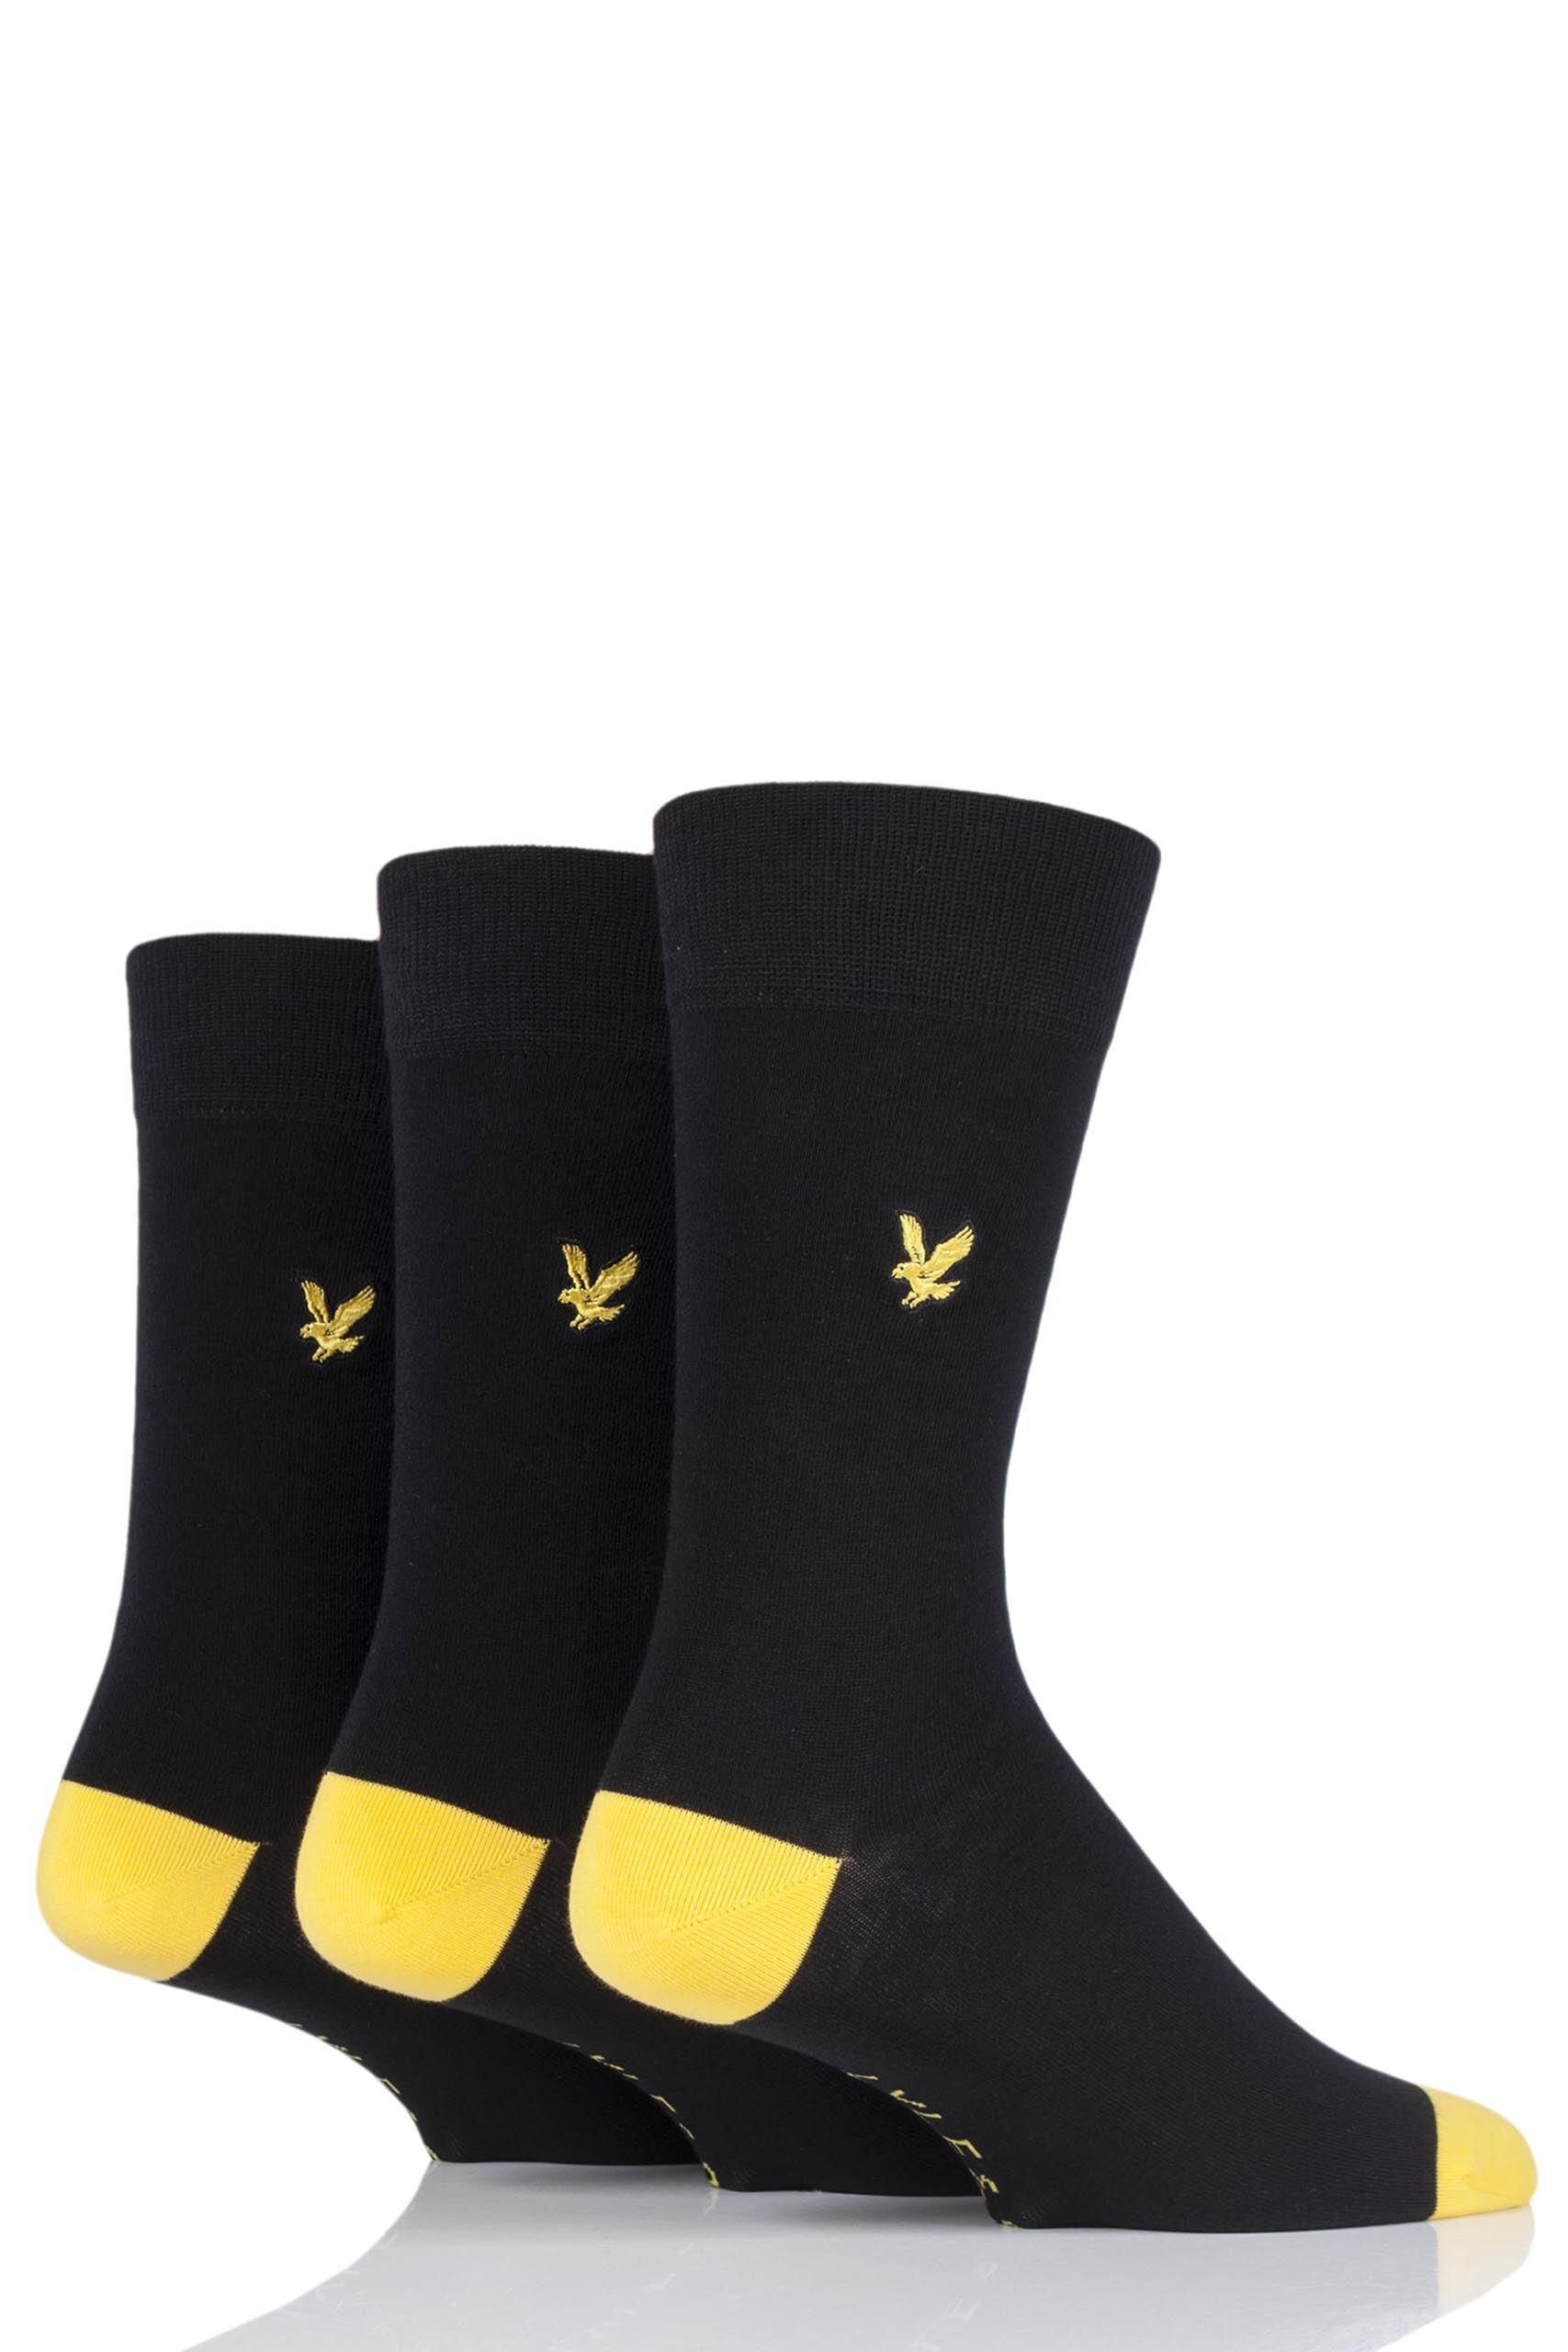 Image of 3 Pair Black Kennedy Contrast Heel and Toe Cotton Socks Men's 7-11 Mens - Lyle & Scott